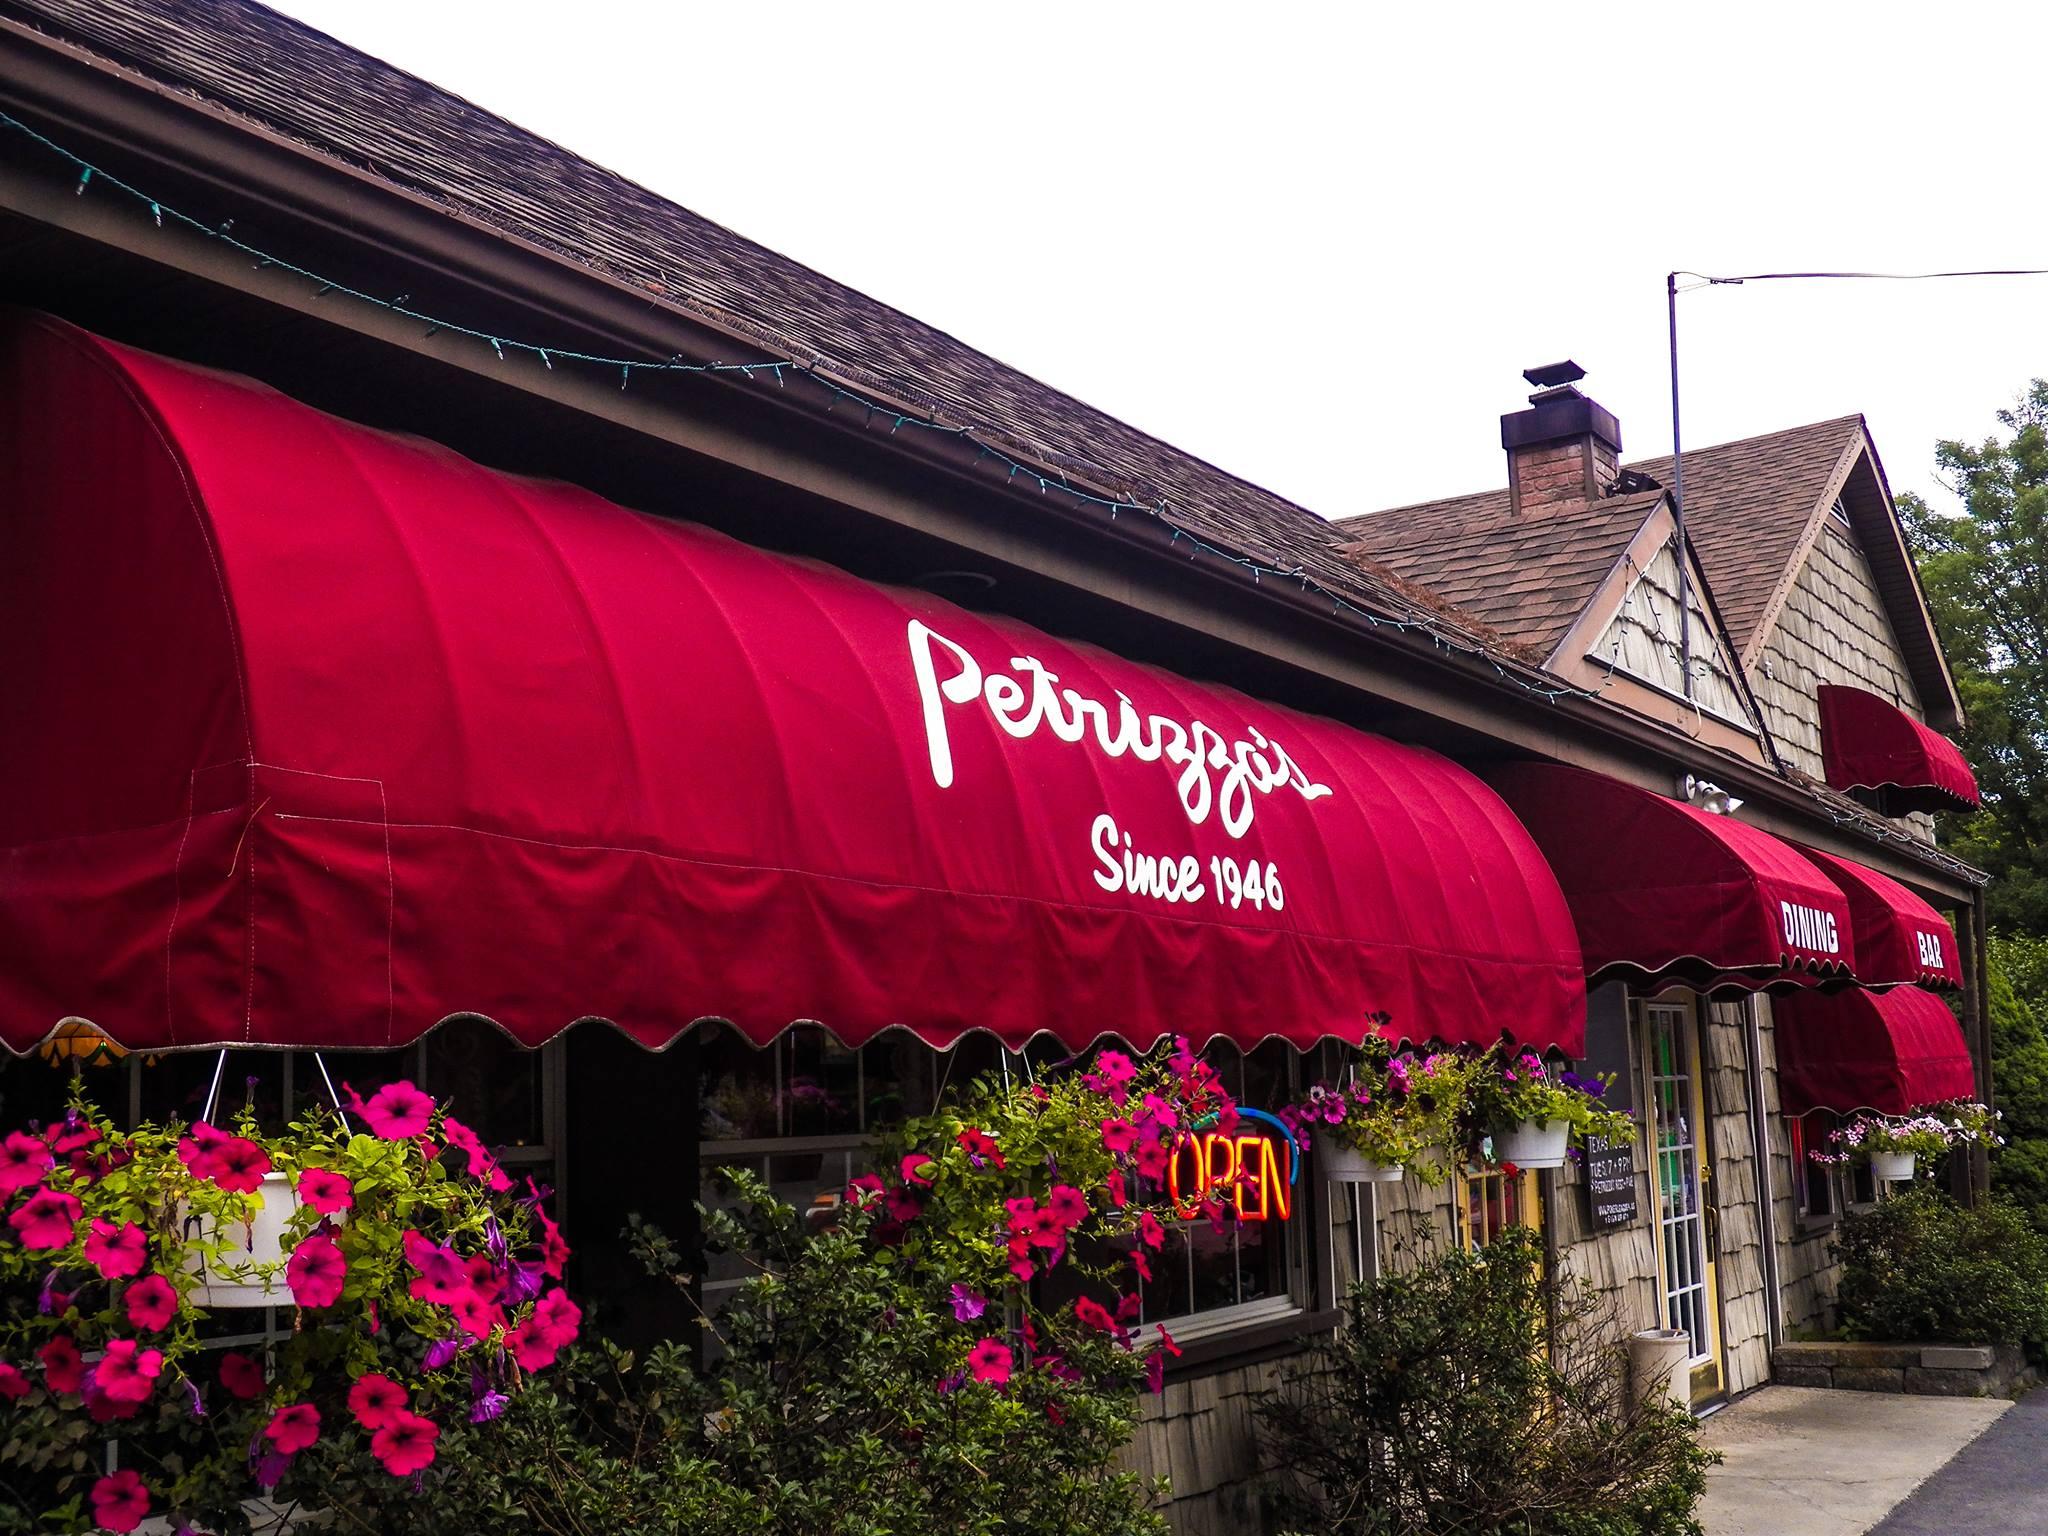 Petrizzos-Restaurant-Bushkill-Italian-Falls-Treetop-Villas-Shawnee-Fairway-Inn